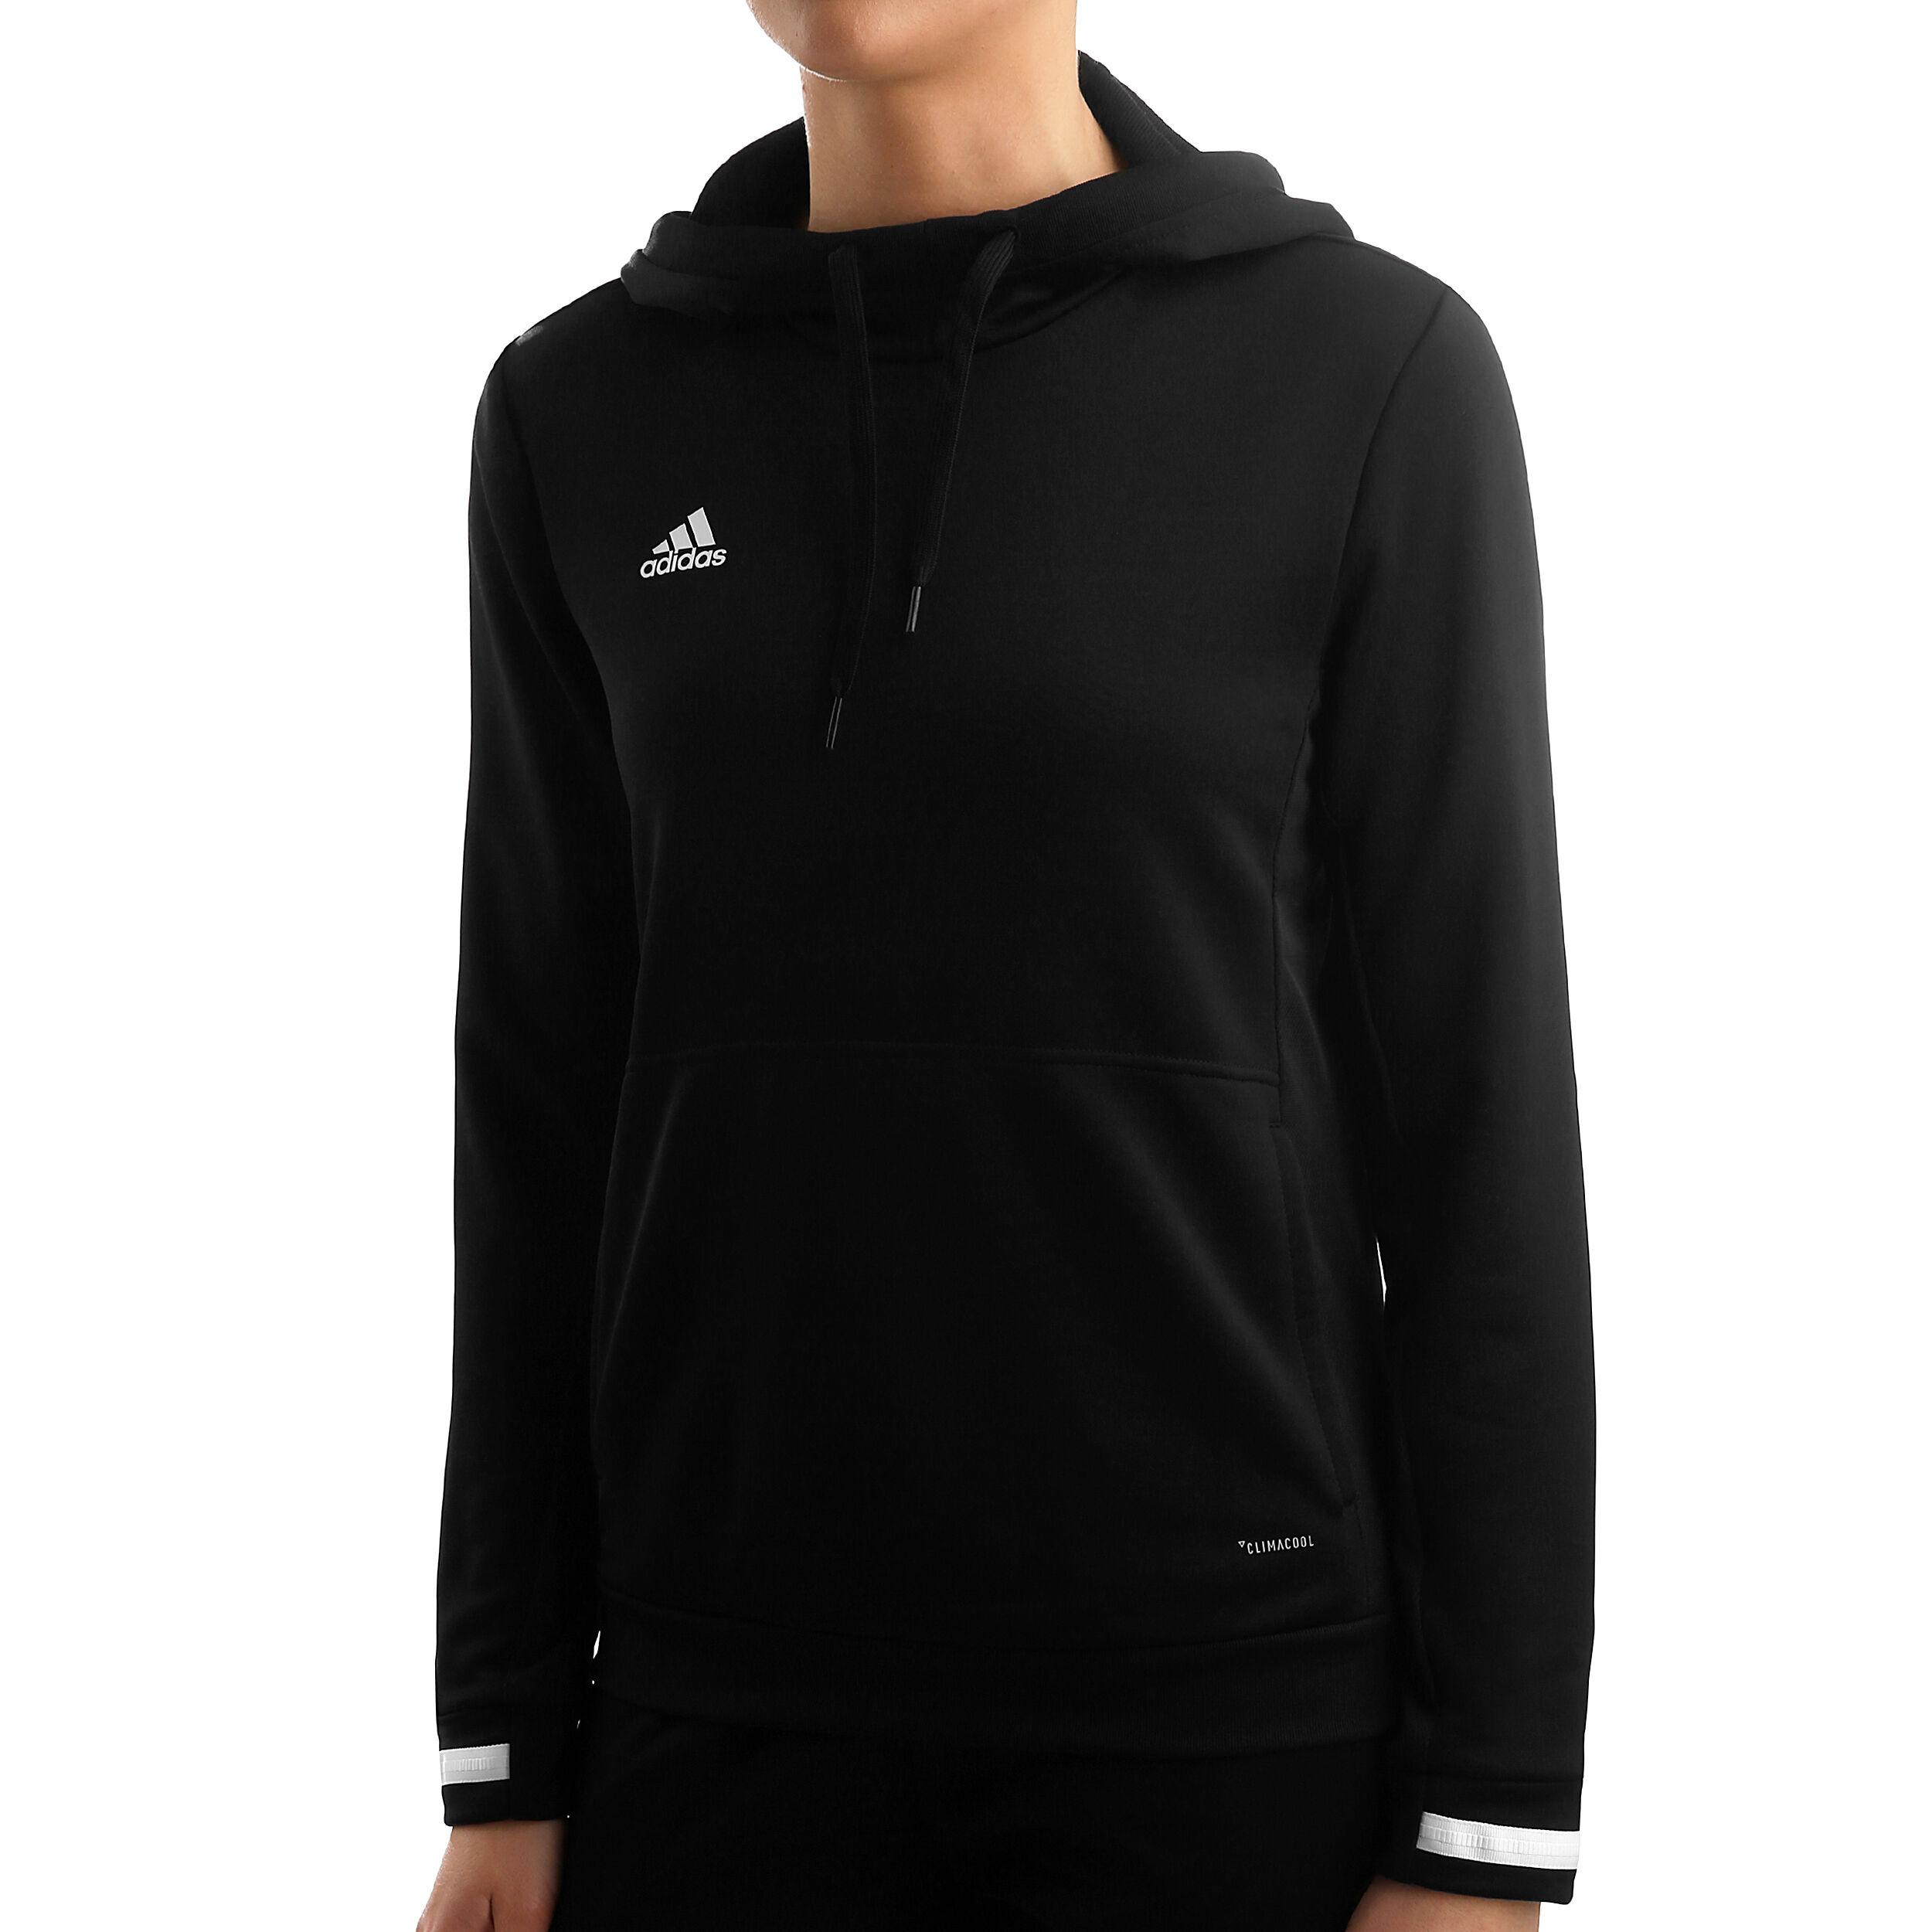 Adidas T19 Hoodie Damen Schwarz Kapuzenpullover